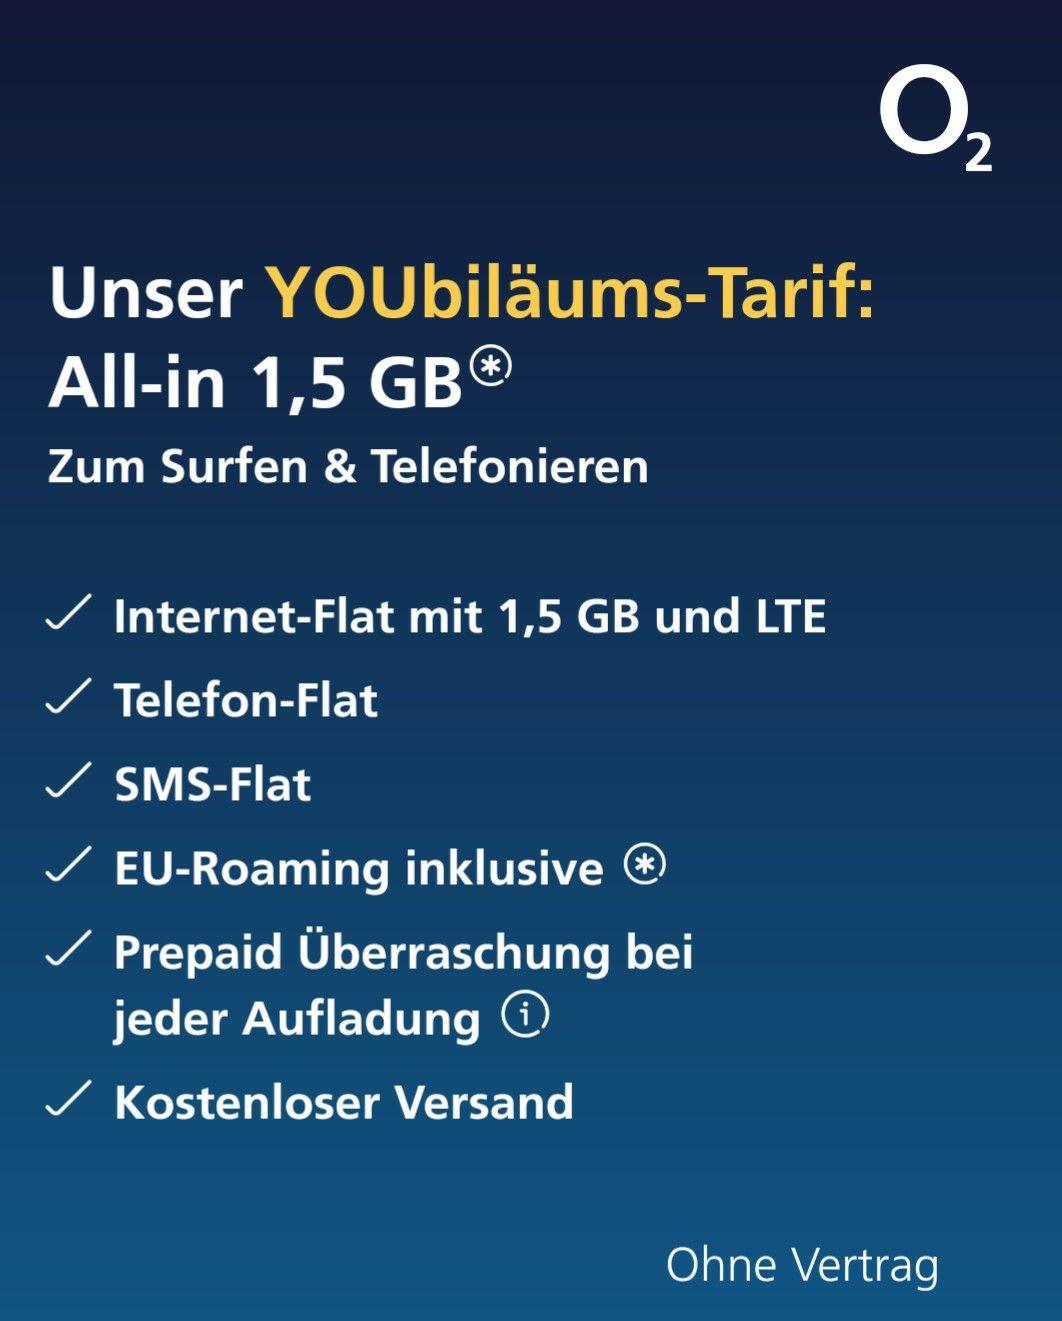 O² YOUbiläums-Prepaid-Tarif